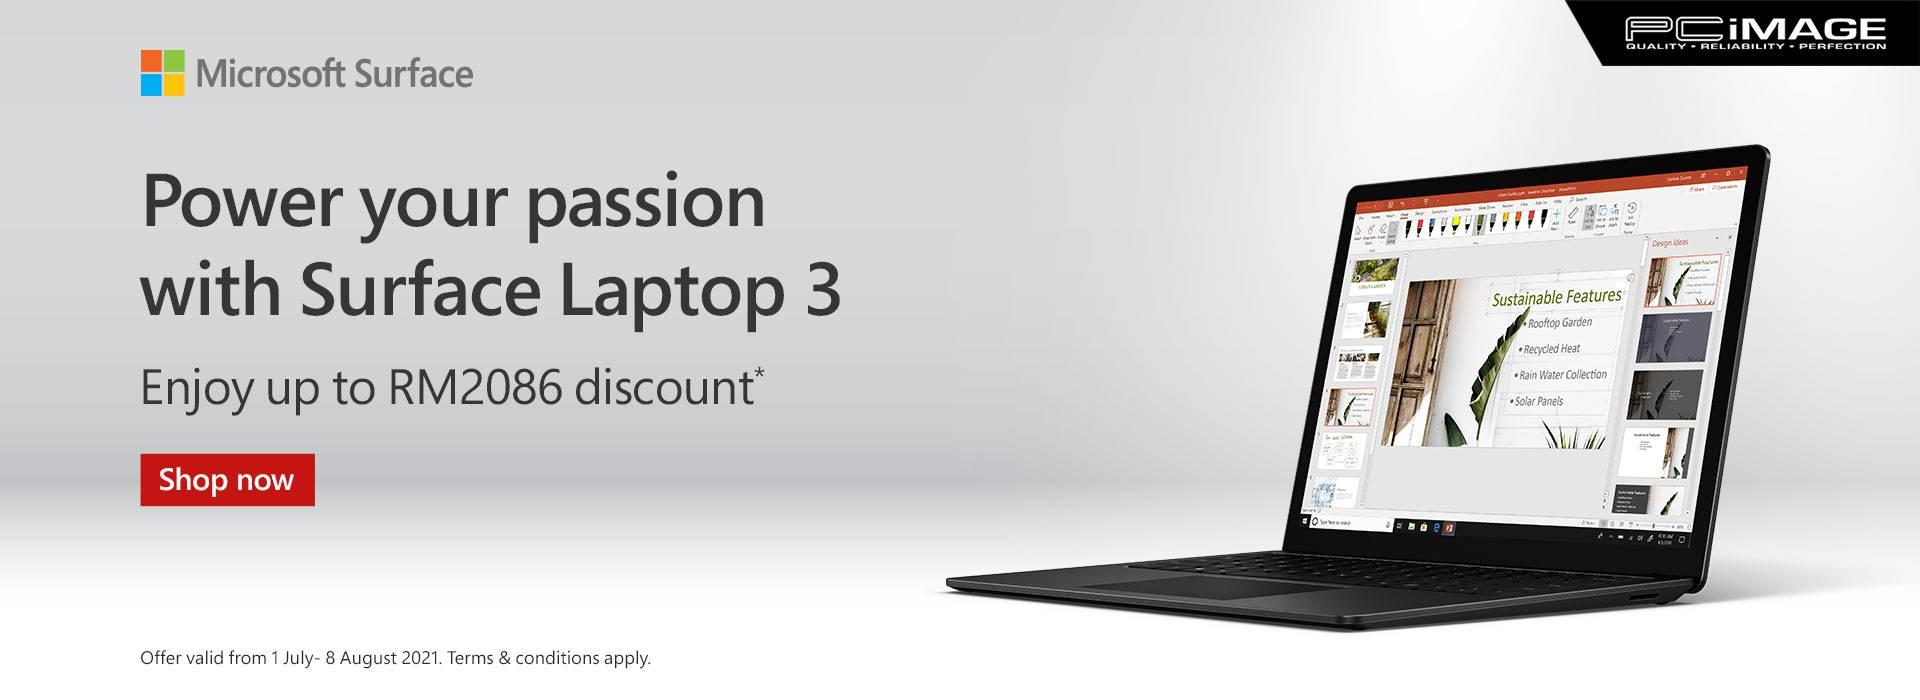 Surface Laptop 3 8 Aug